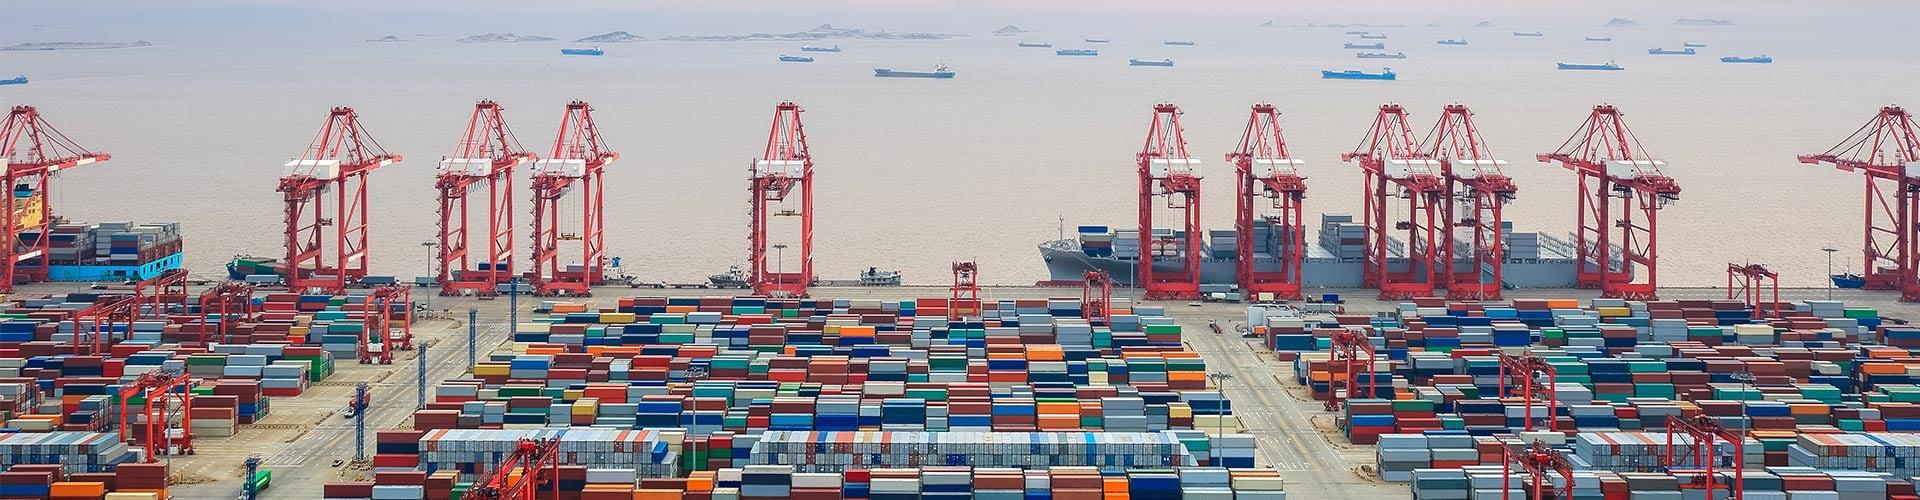 UWL-Port-Aeriel-Vessels-In-Distance1920x500